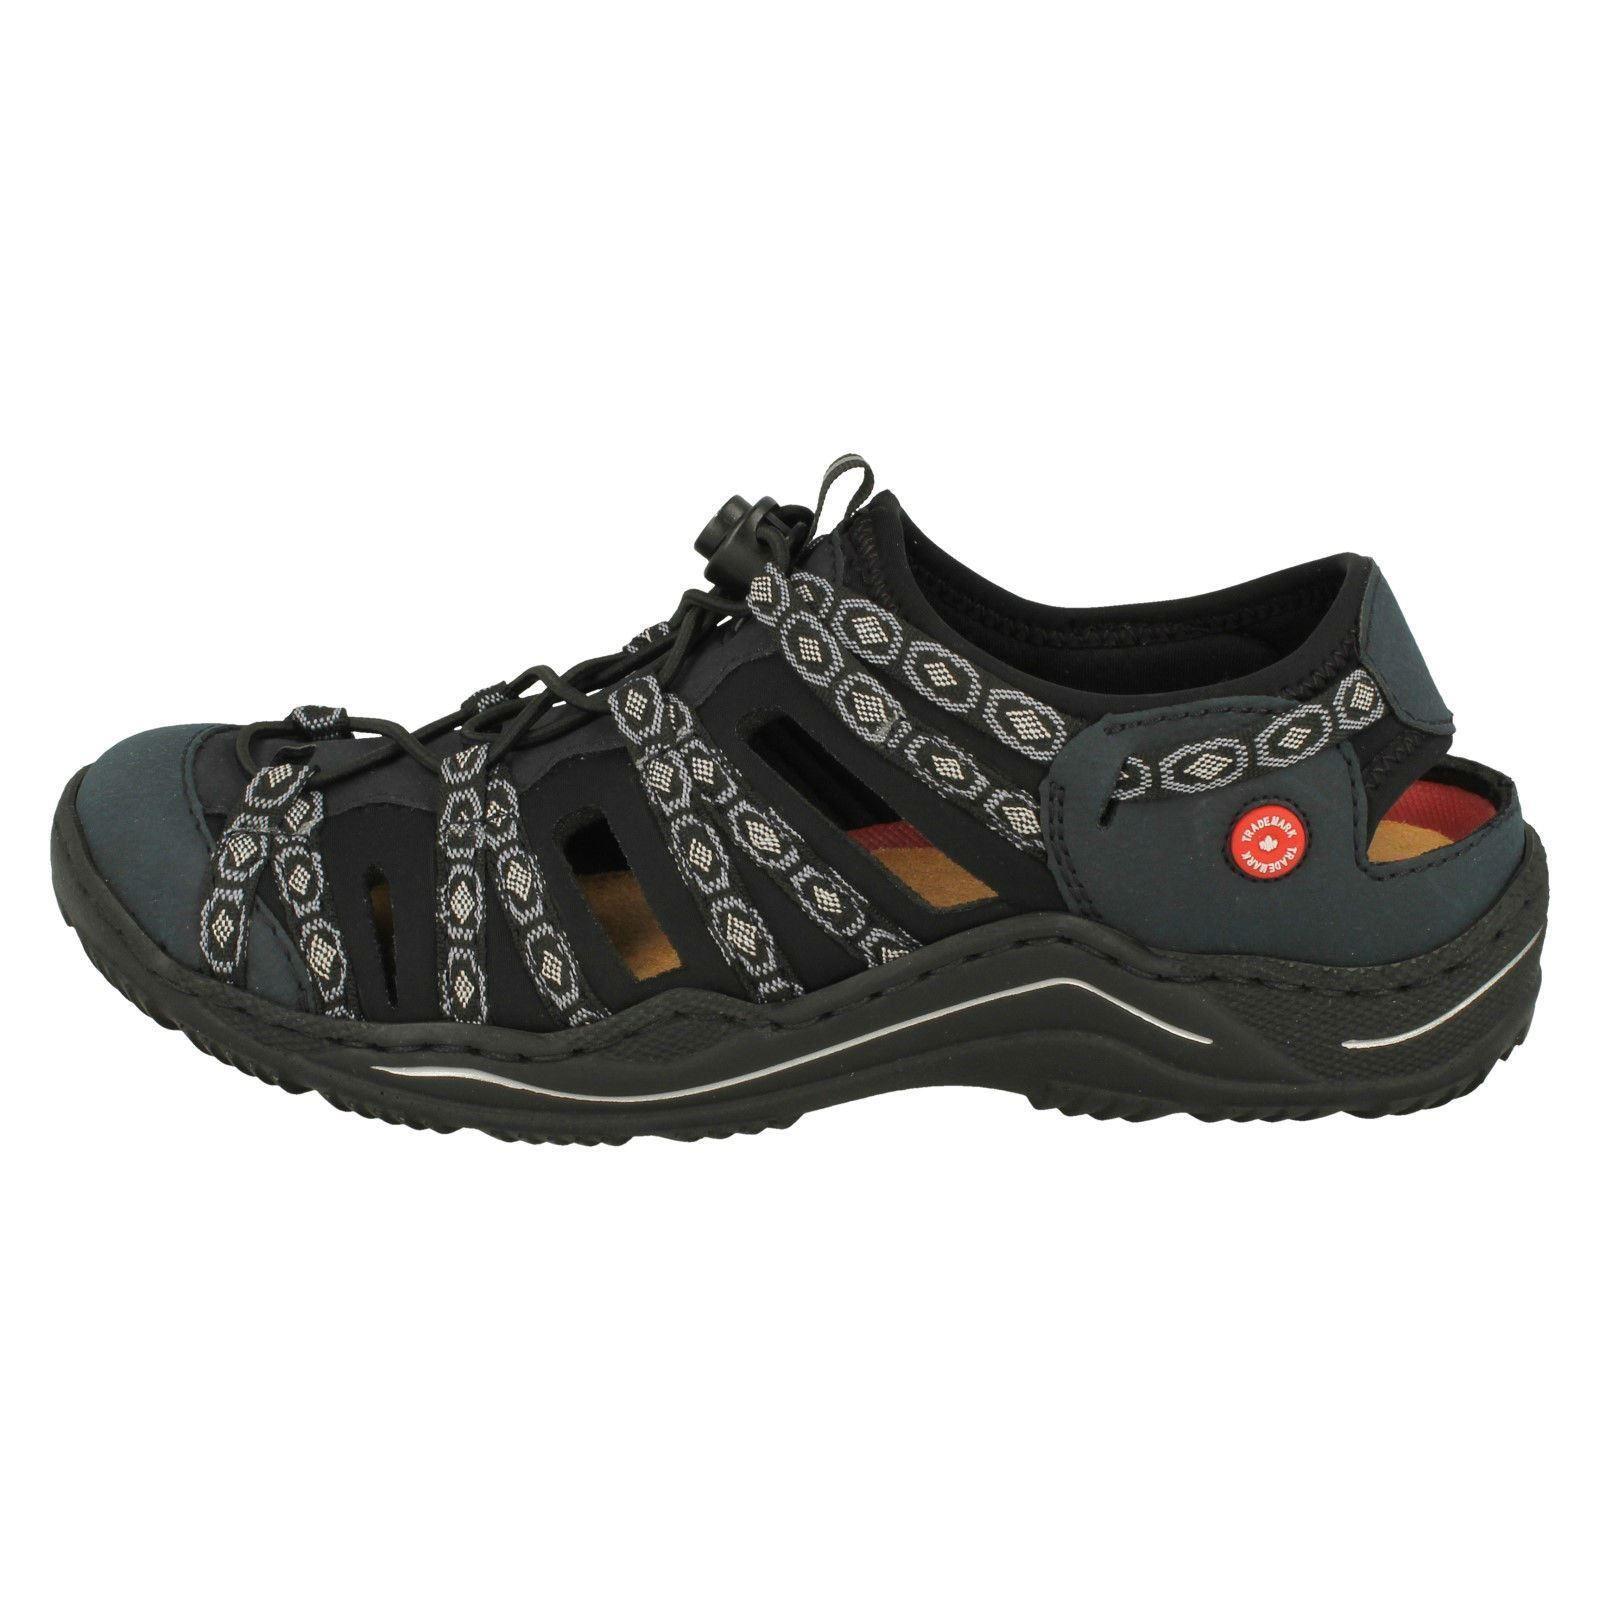 Damas Rieker Sandalias de dedo del pie cerrado el estilo-L0577